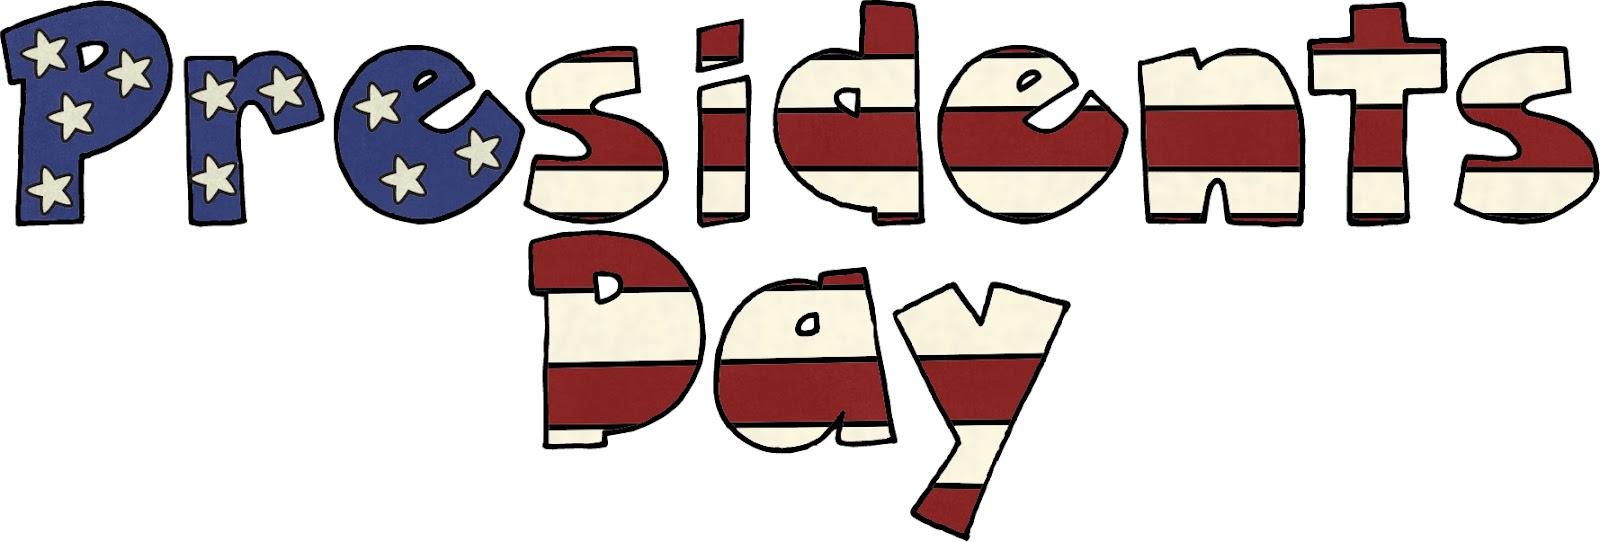 Happy Presidents Day Presidentsday-Happy Presidents Day Presidentsday-11